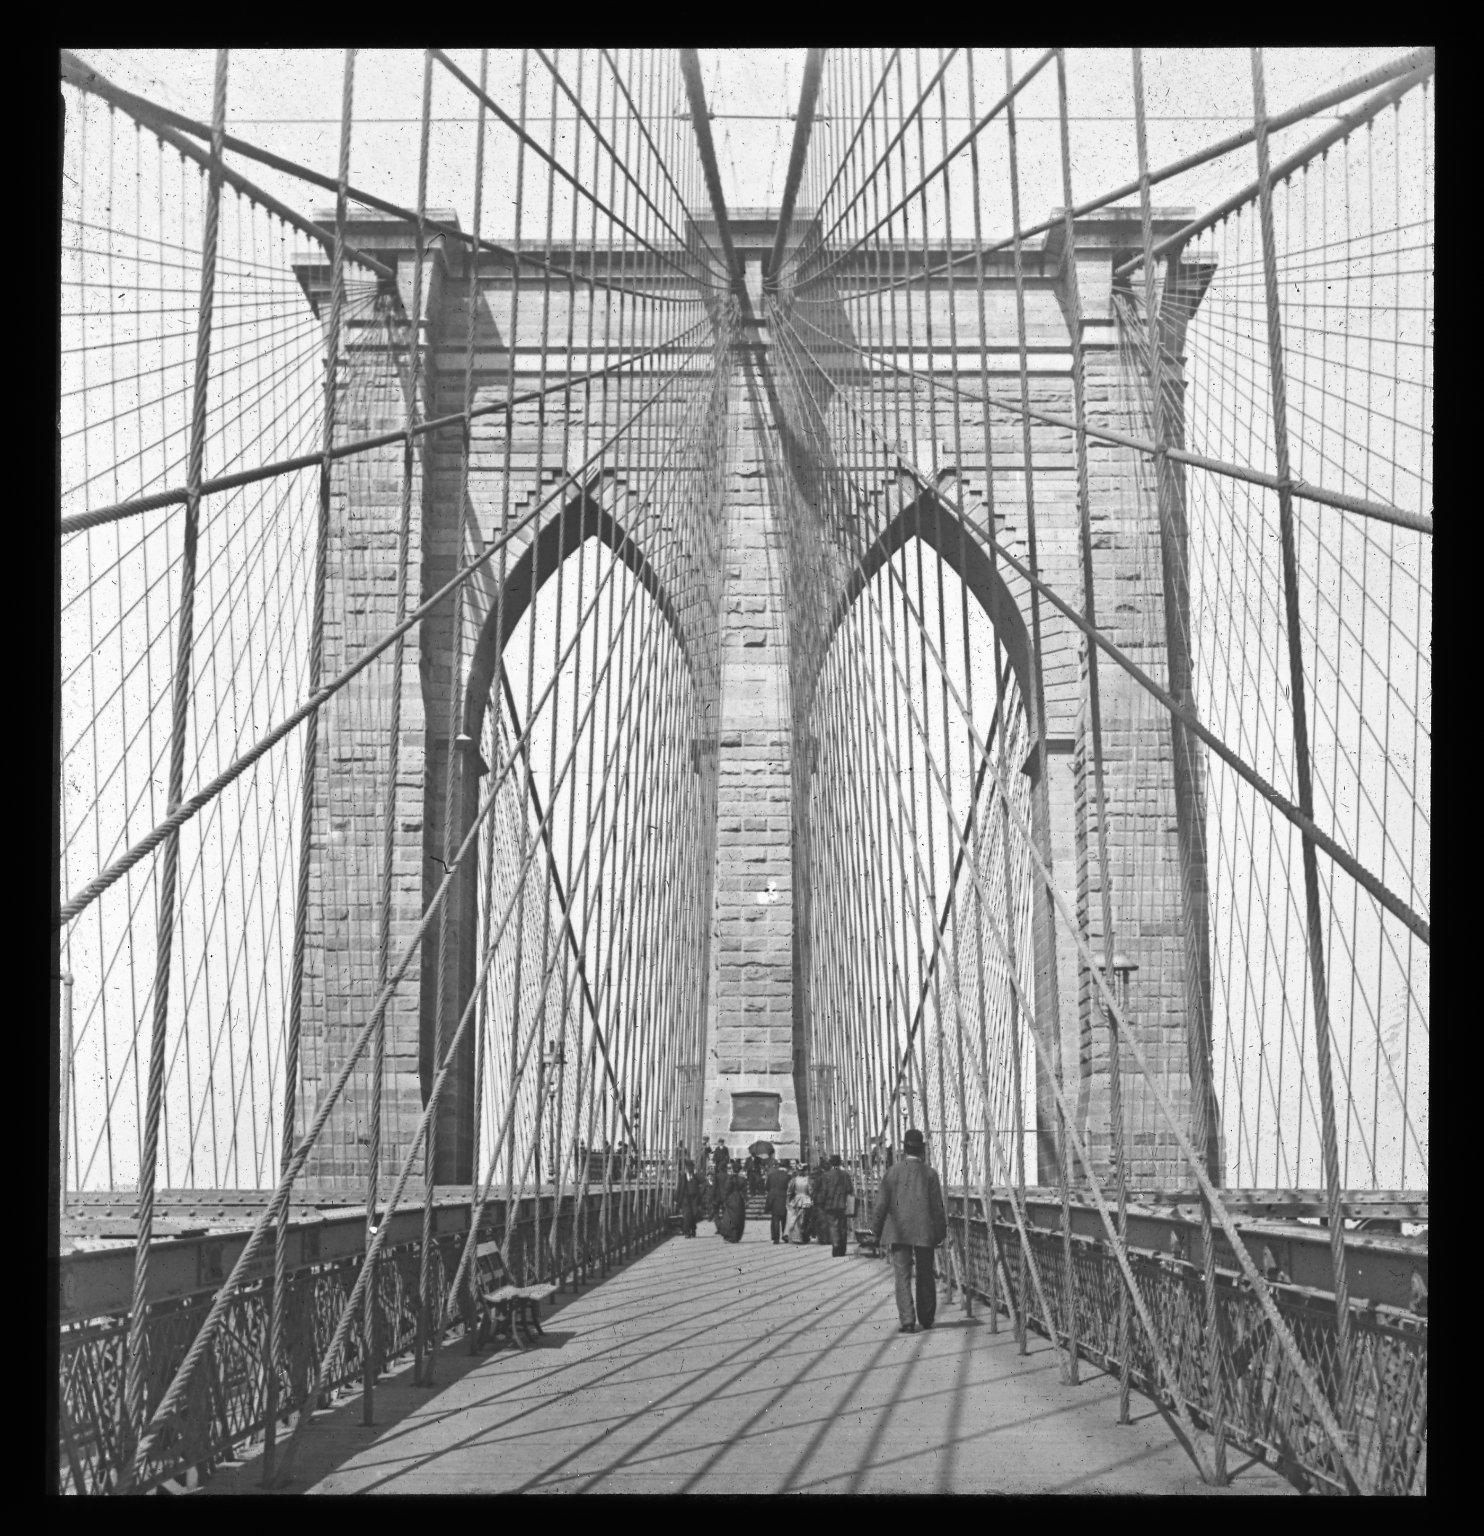 Pedestrian crossing at the Brooklyn Bridge in New York City (1896)